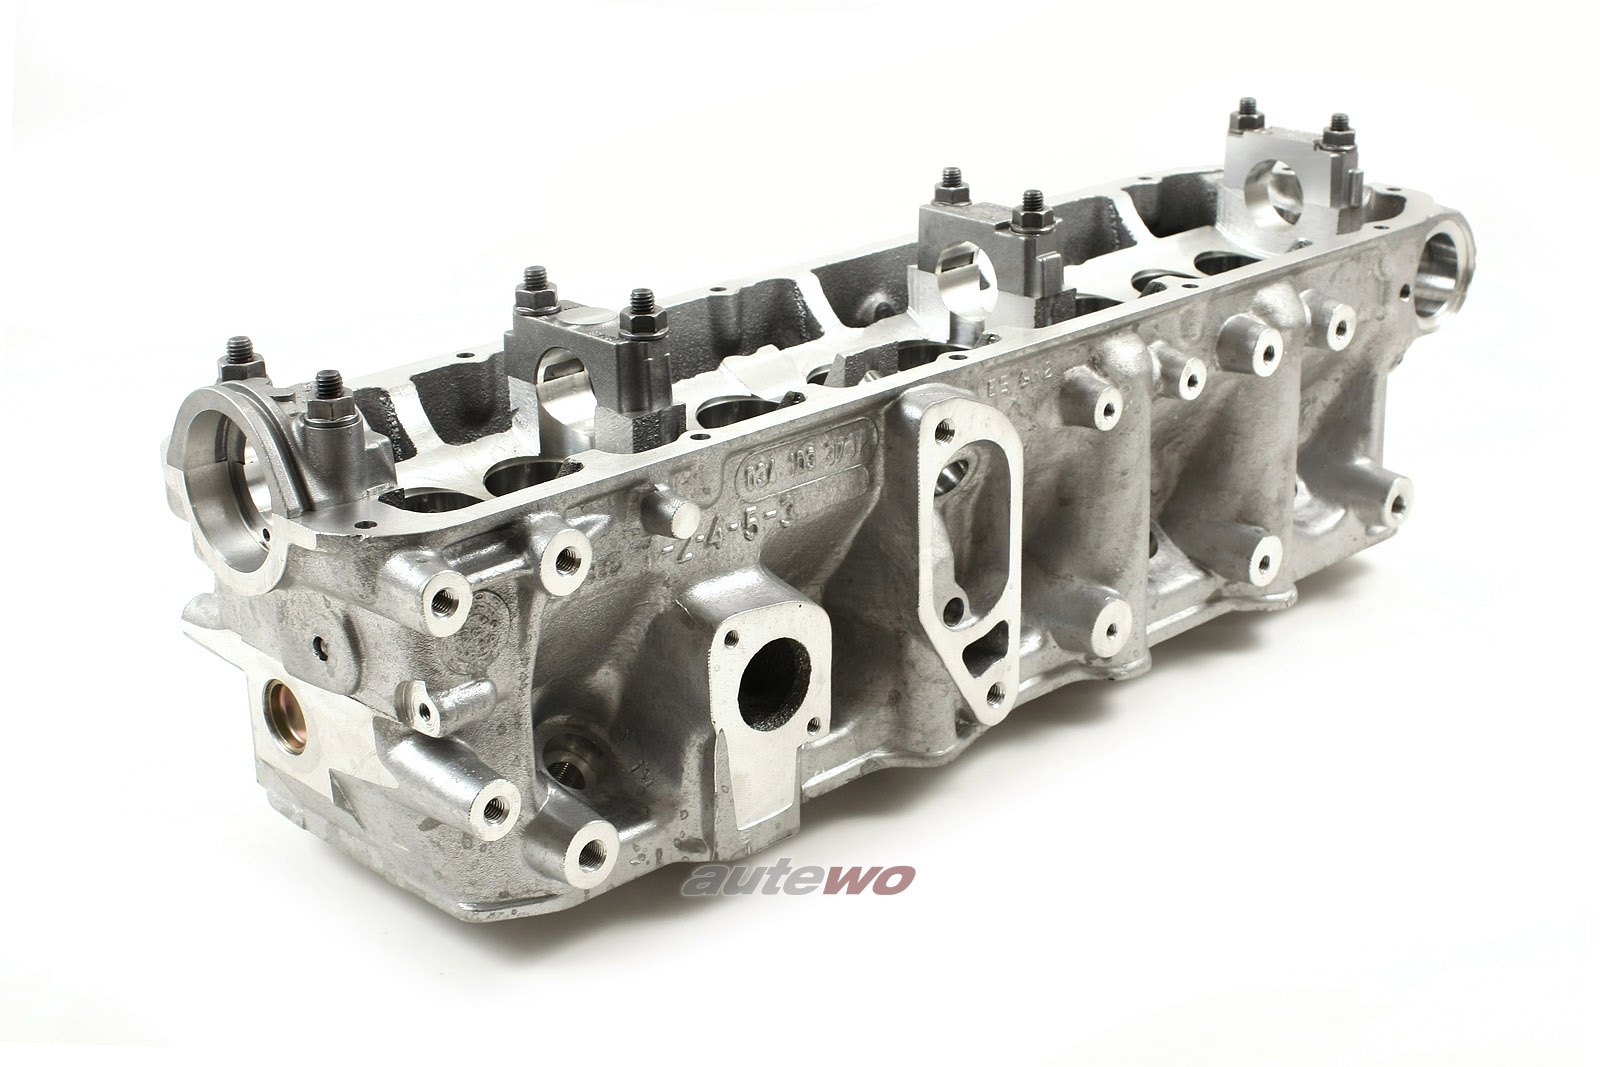 034103351C NEU Audi 90 Typ 89/100 Typ 44 2.3l  5 Zyl. NG/AAR/NF Zylinderkopf